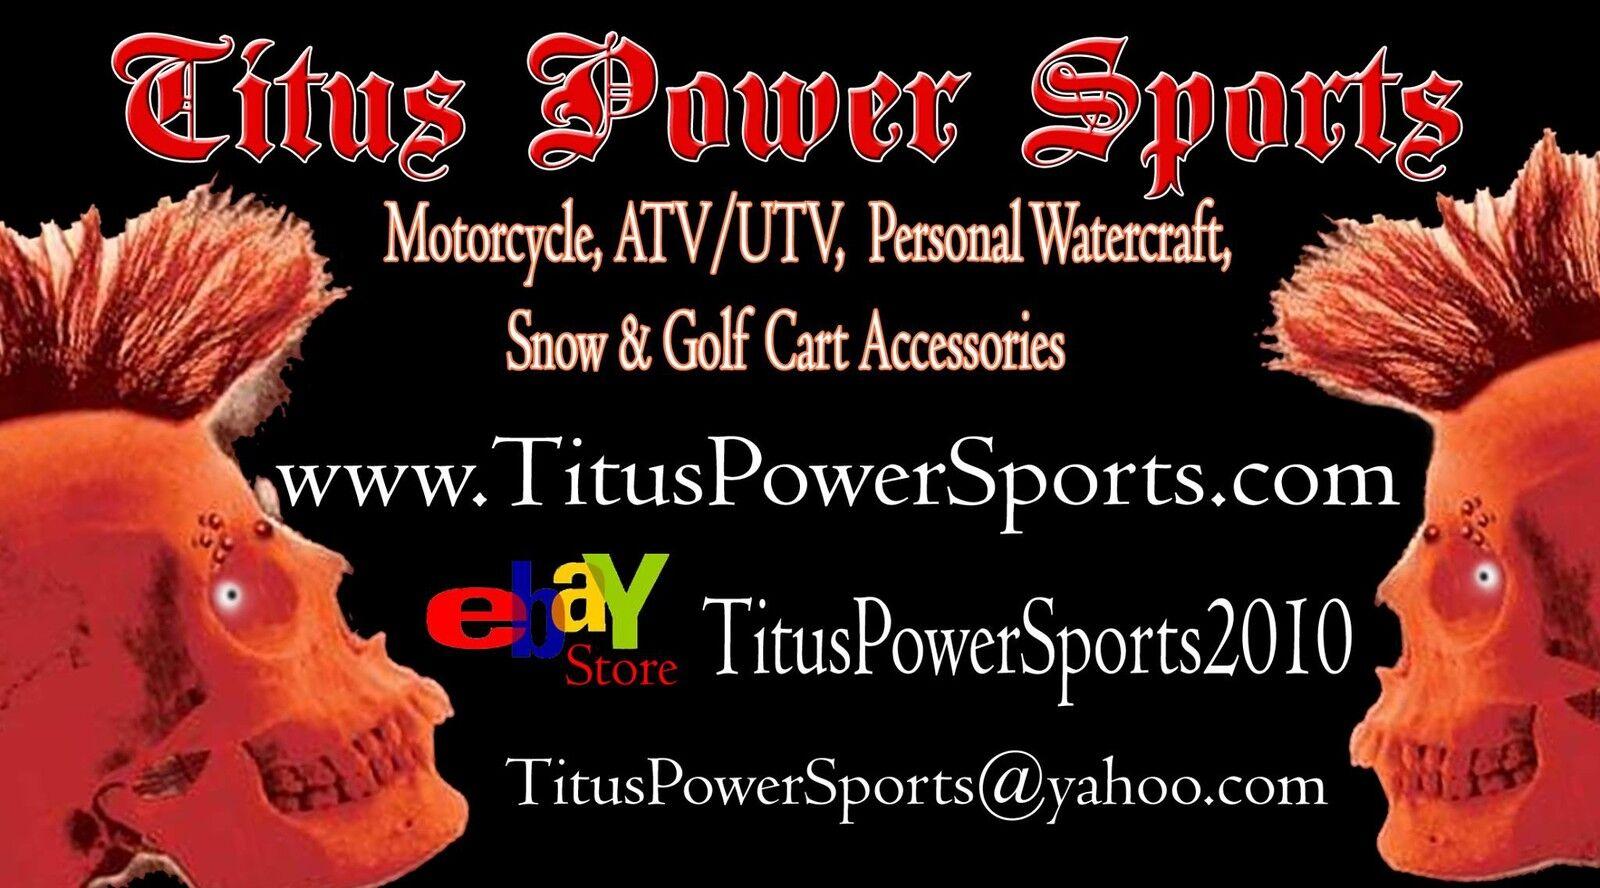 tituspowersports2010